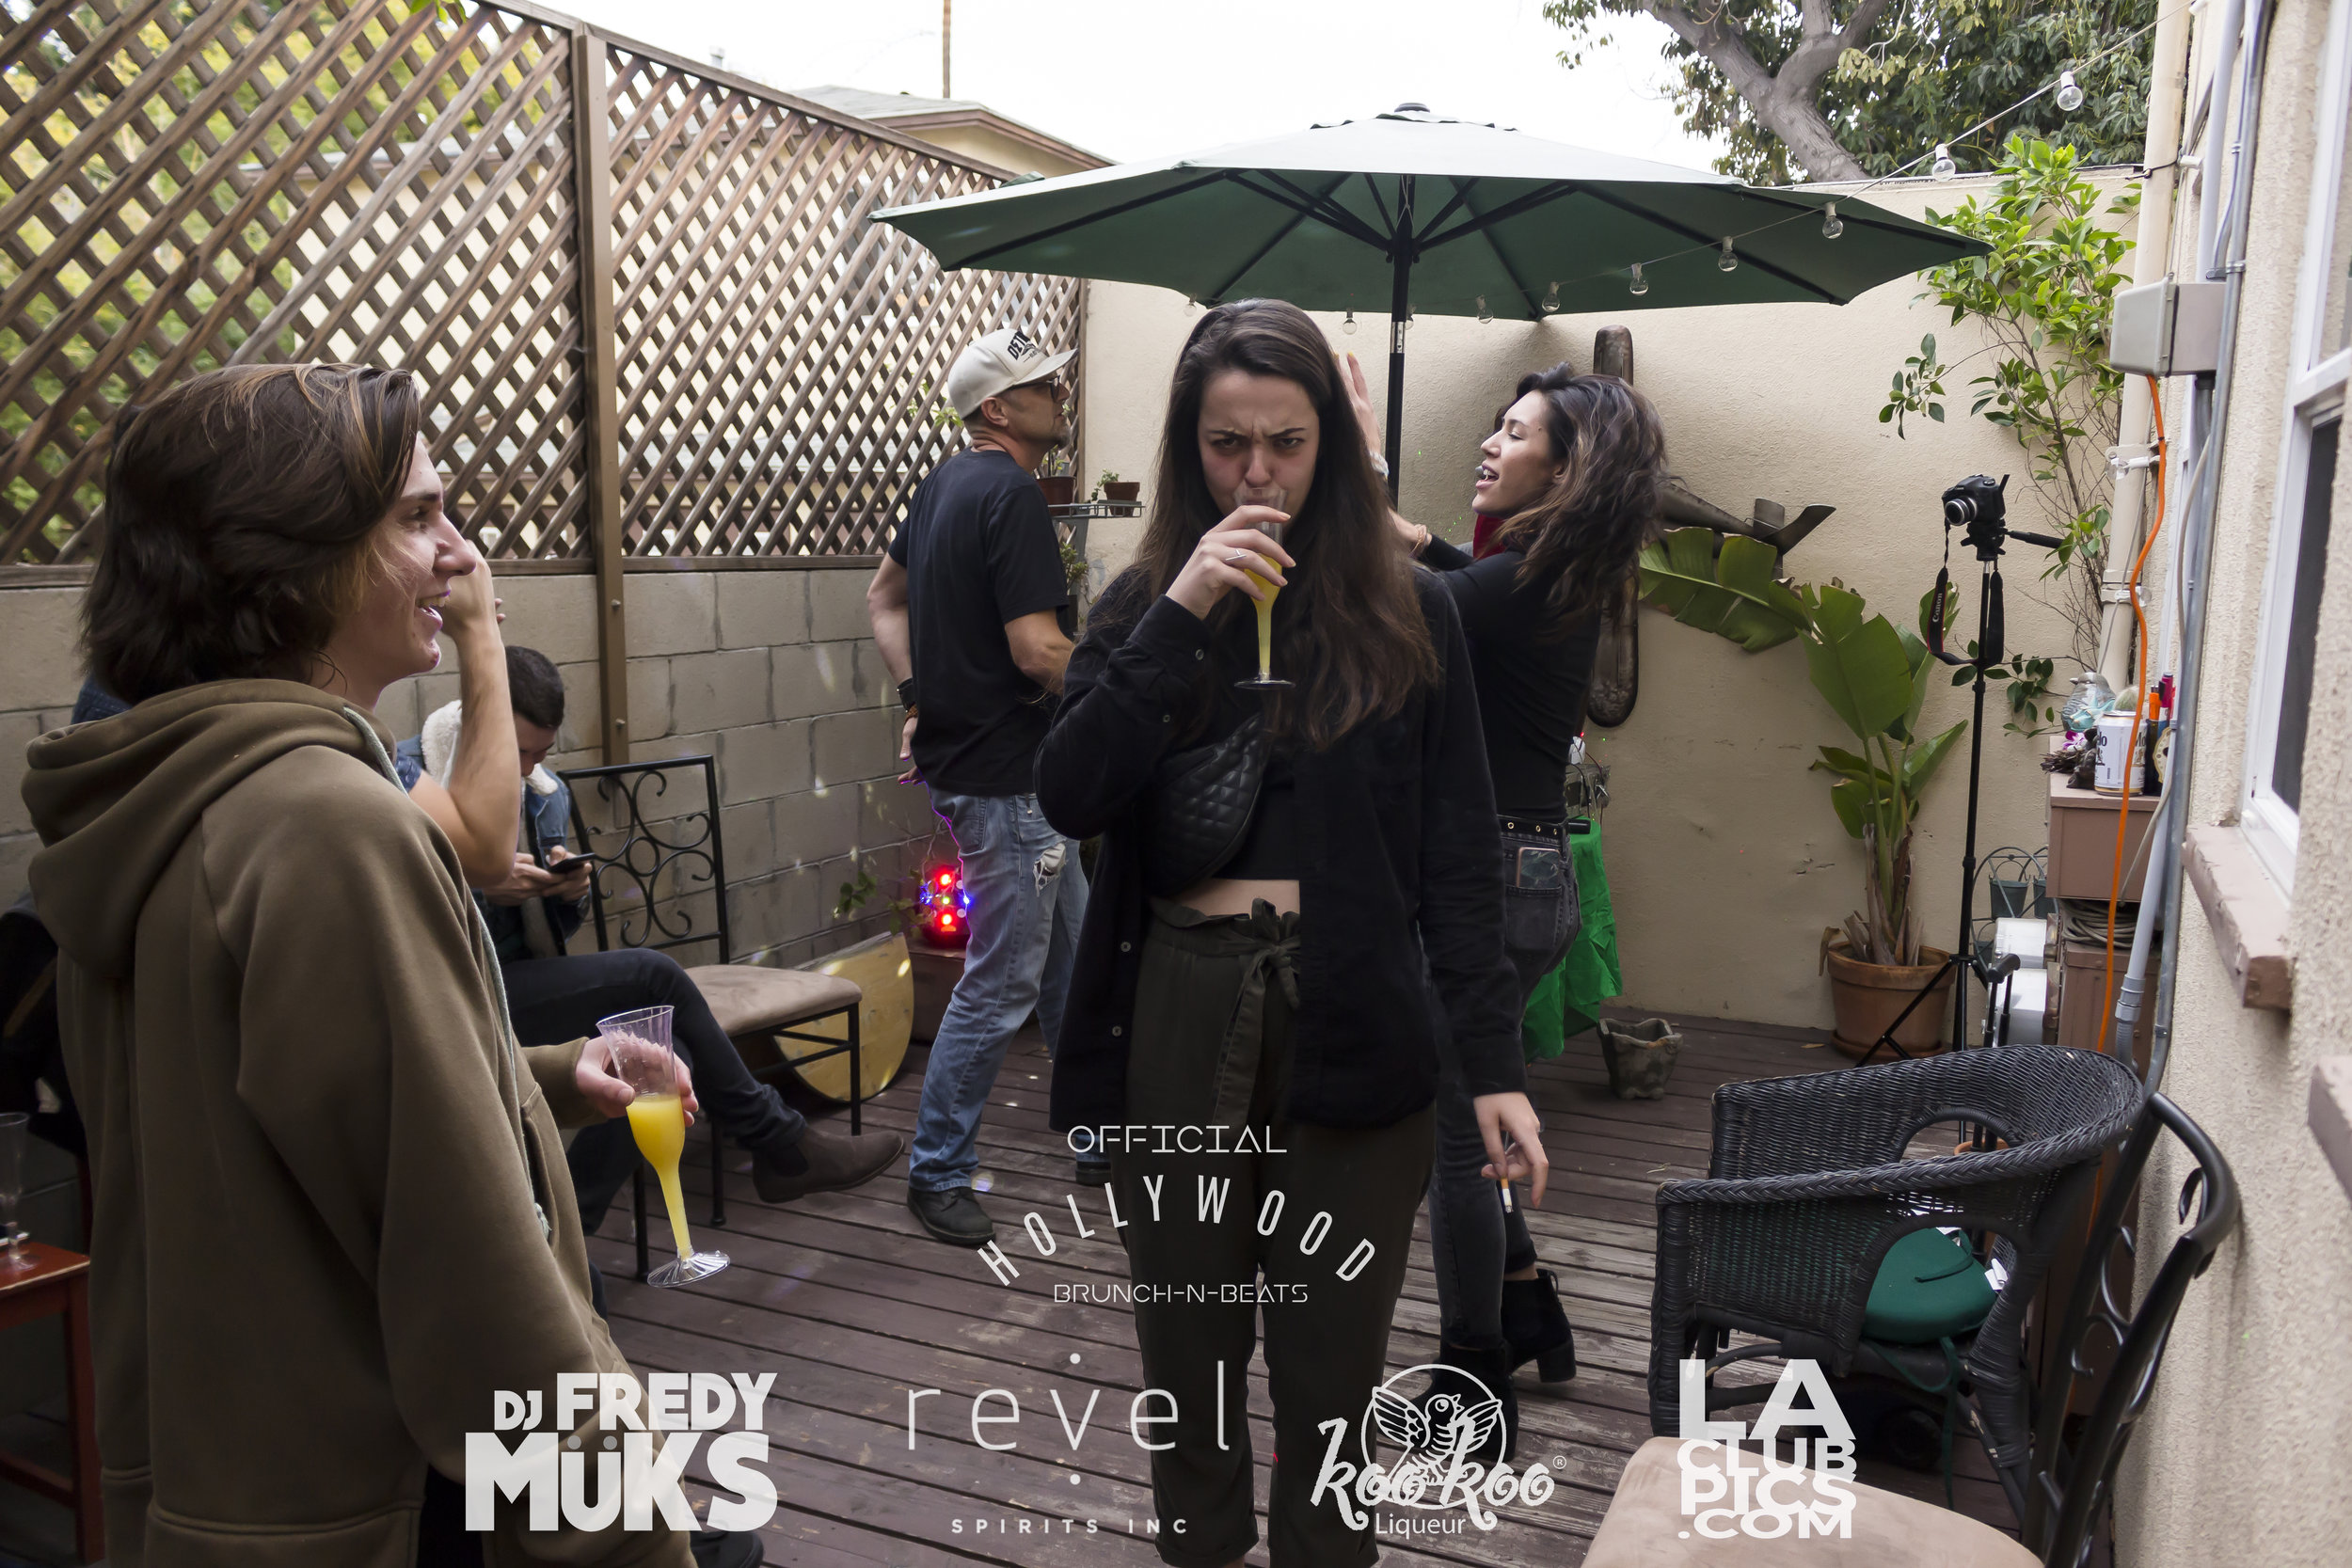 Hollywood Brunch-N-Beats - 03-18-18_208.jpg